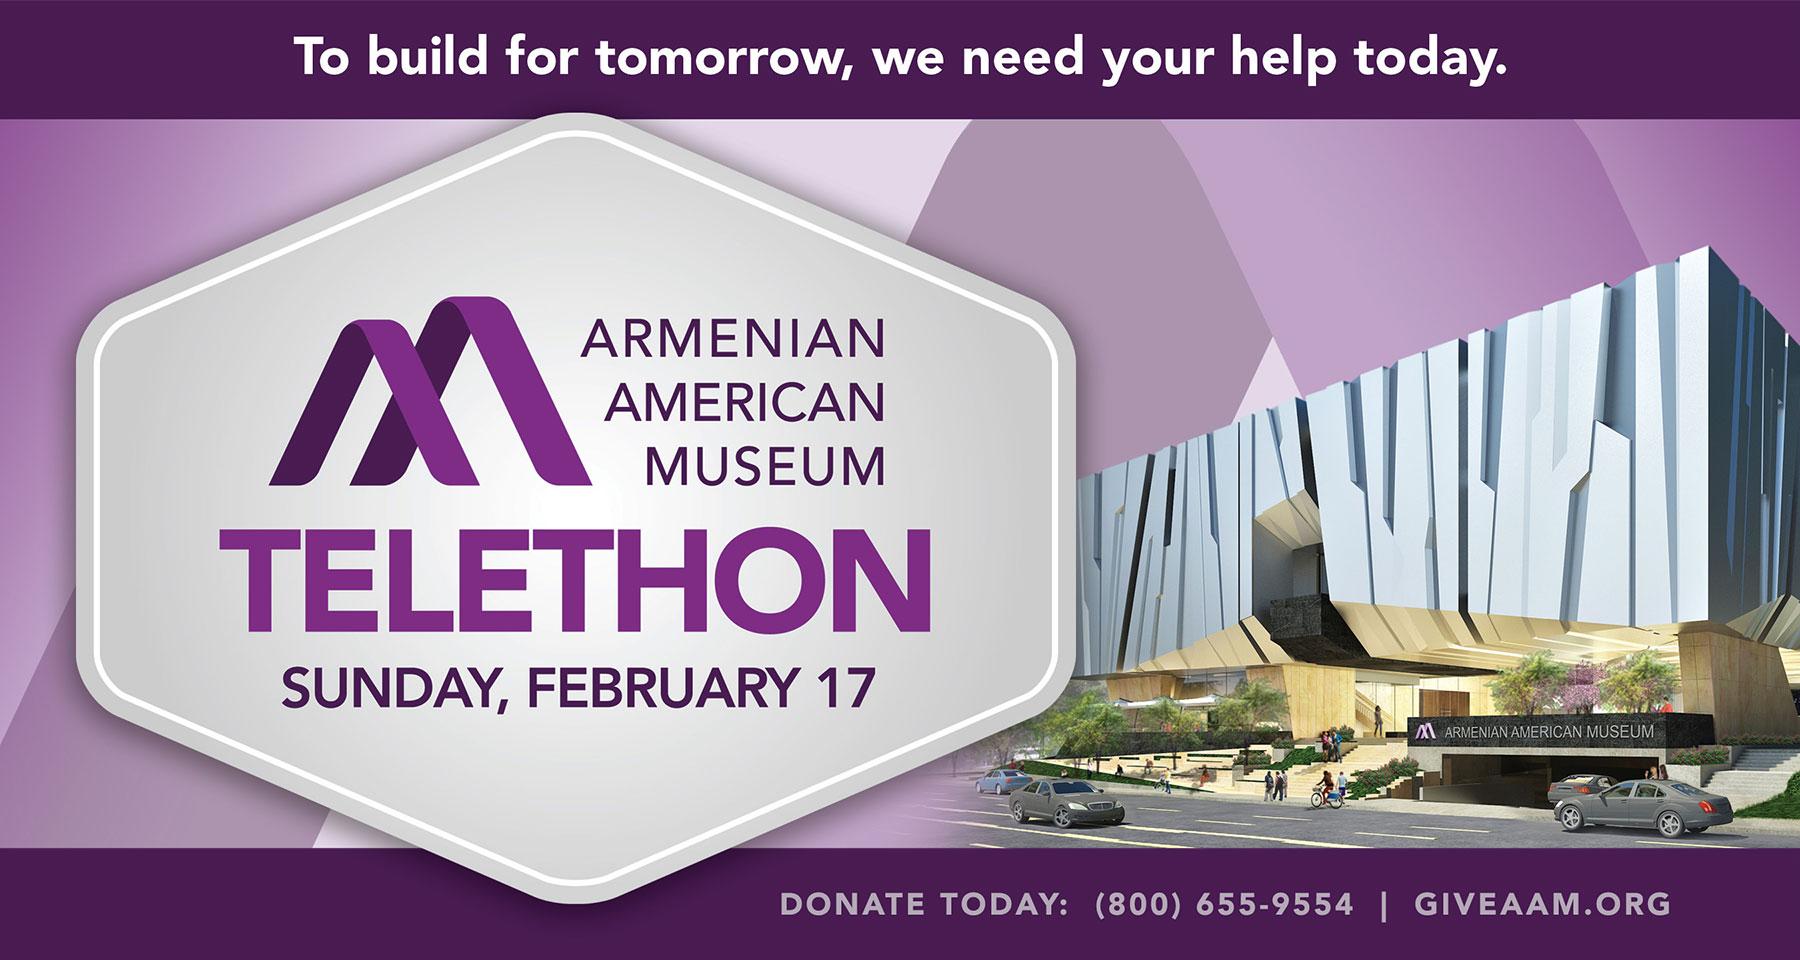 Armenian American Museum Telethon